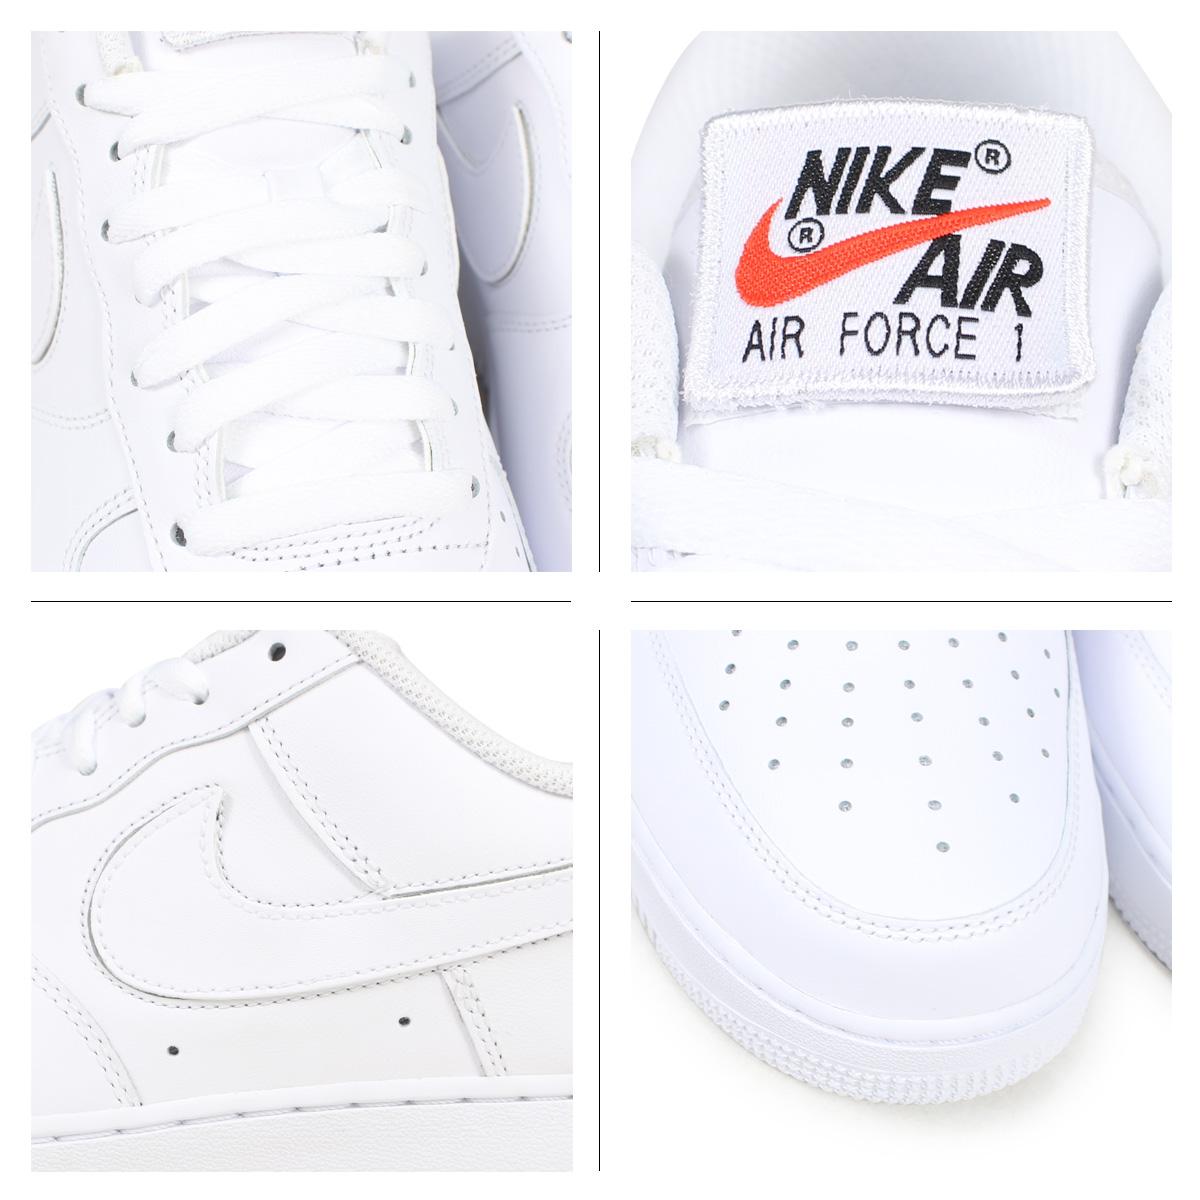 online store 56179 d50d9 Nike NIKE air force 1 sneakers men AIR FORCE 1 LOW QS SWOOSH PACK AH8462-102  white  187